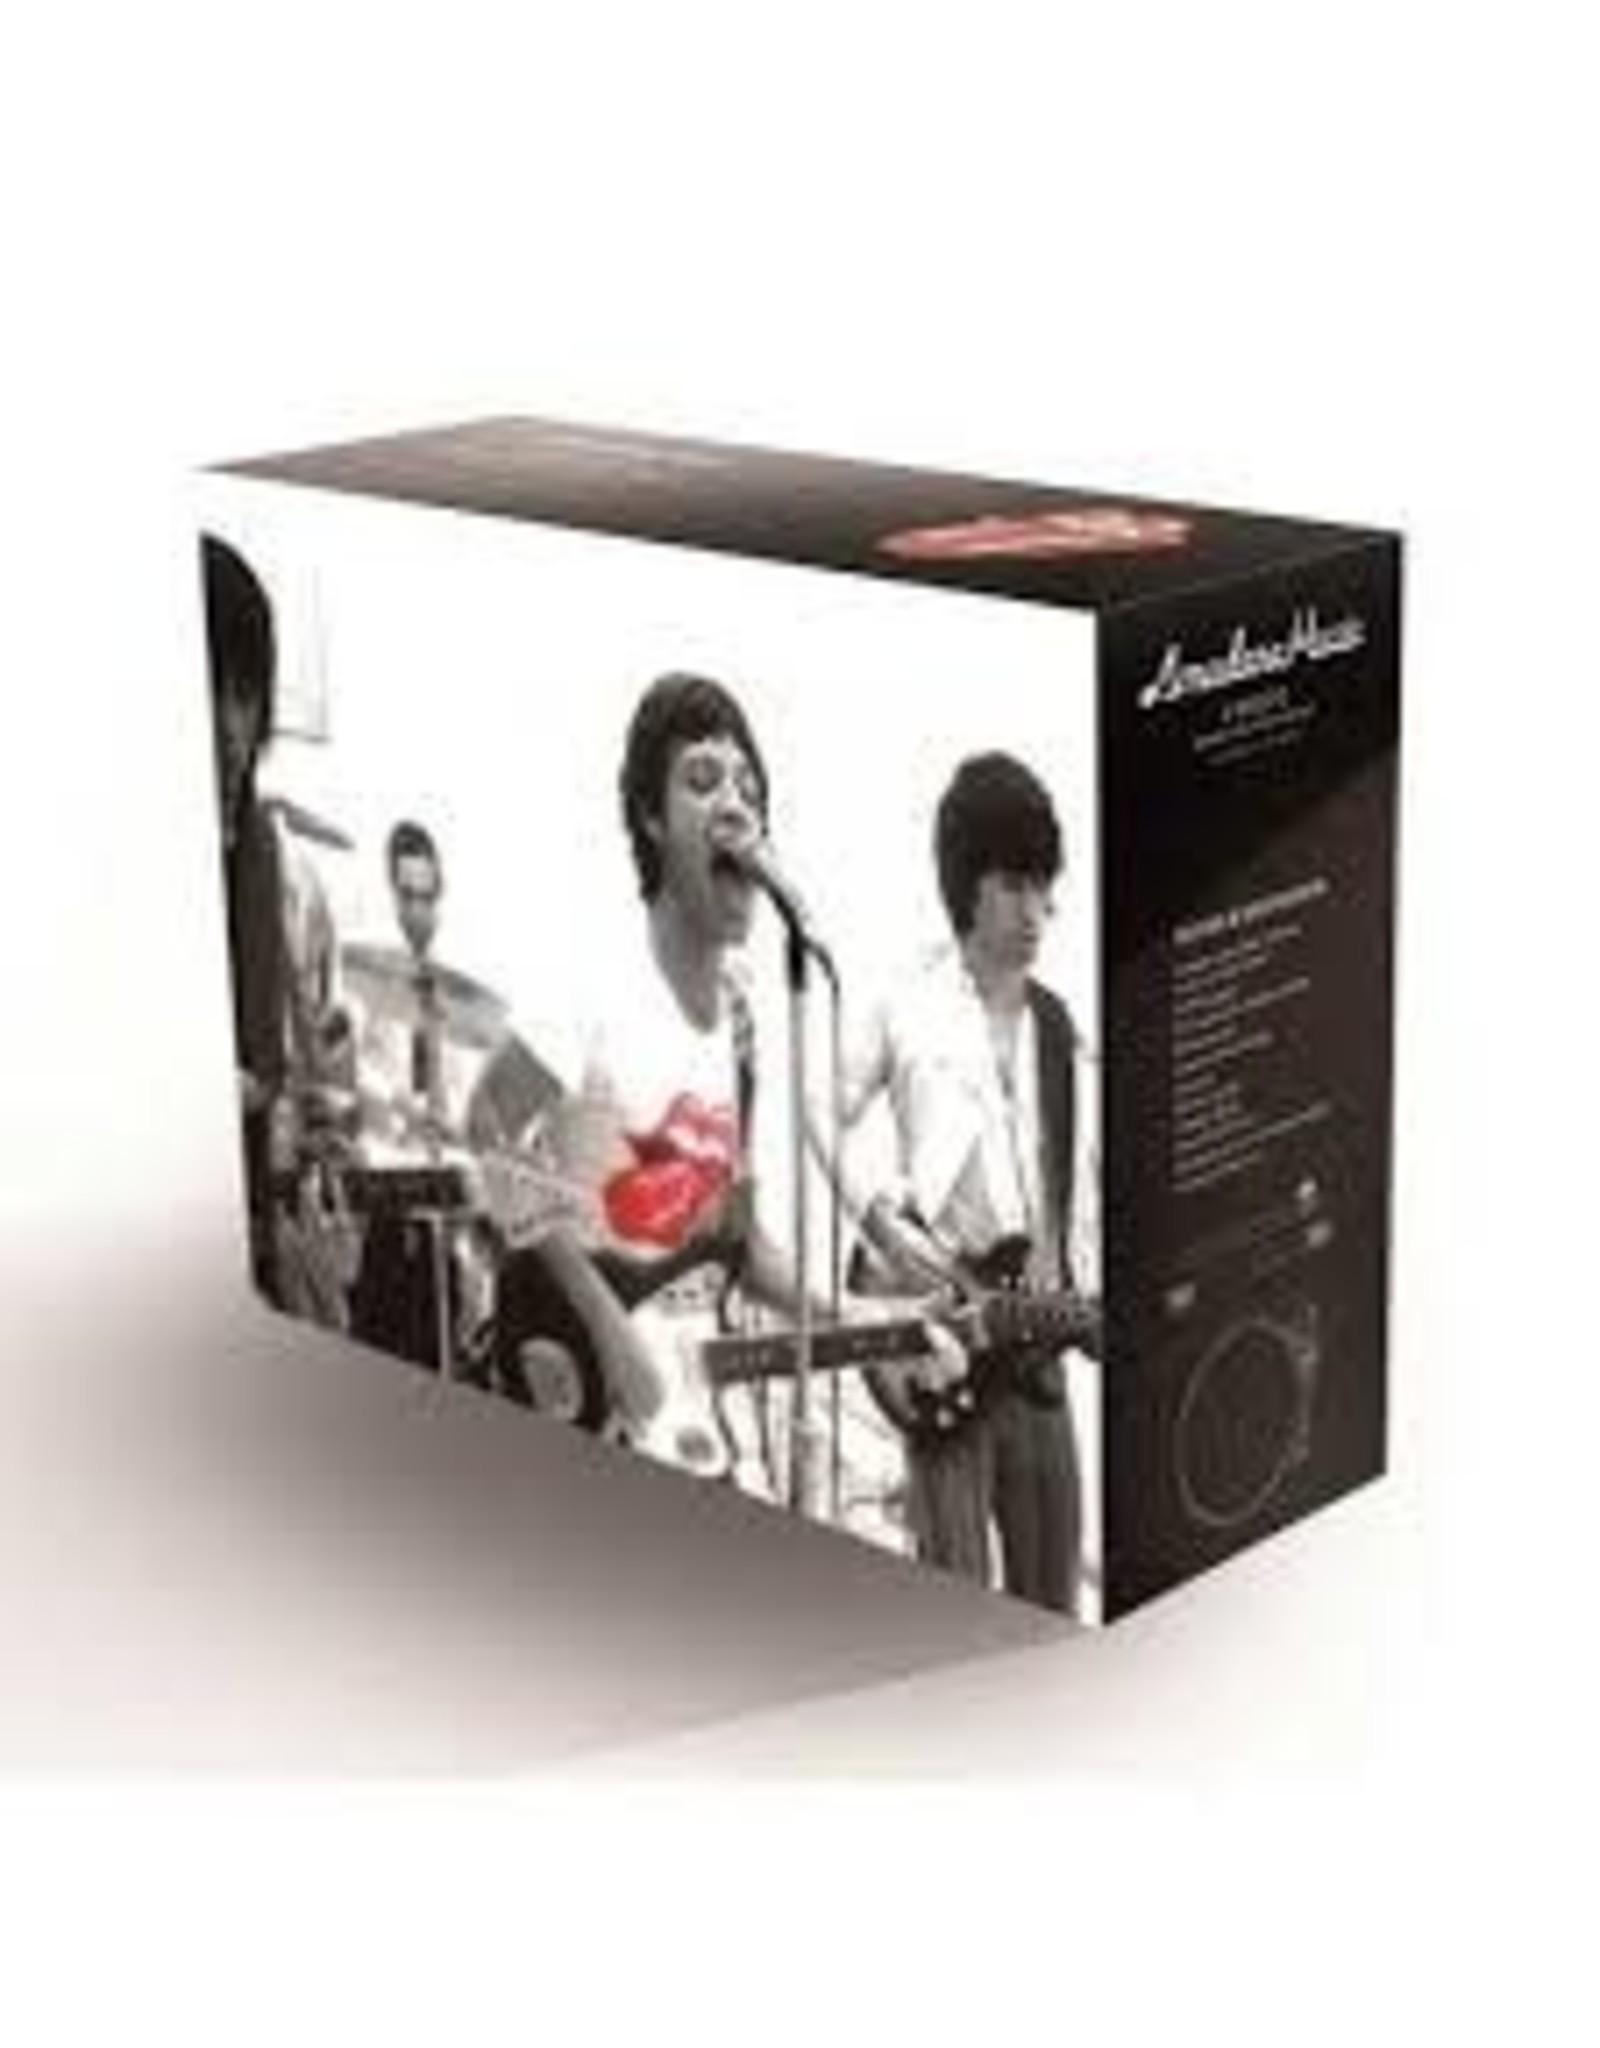 AMADANA MUSIC SIBRECO SPEAKER INBUILT RECORD PLAYER - THE ROLLING STONES